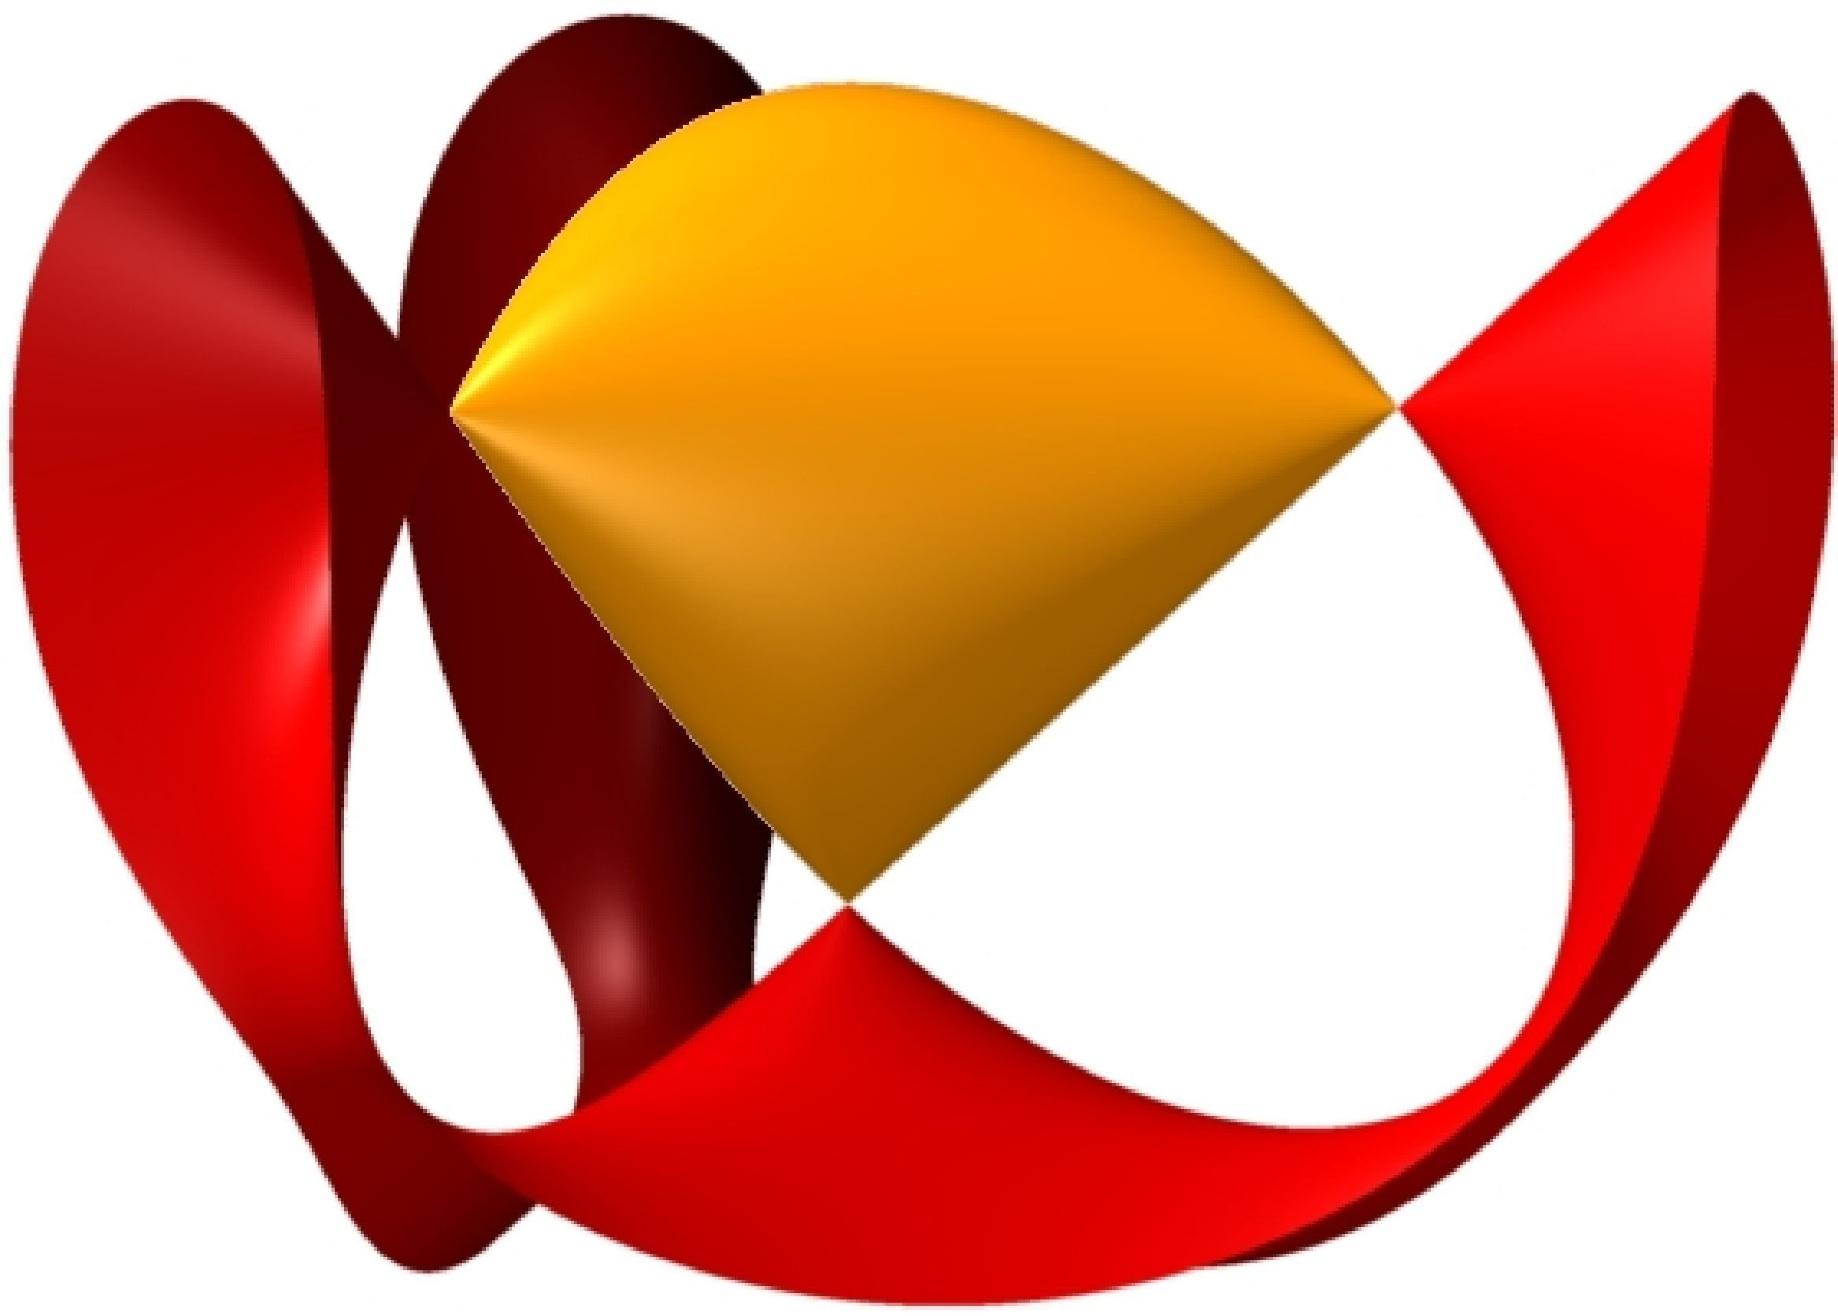 EE227BT: Convex Optimization